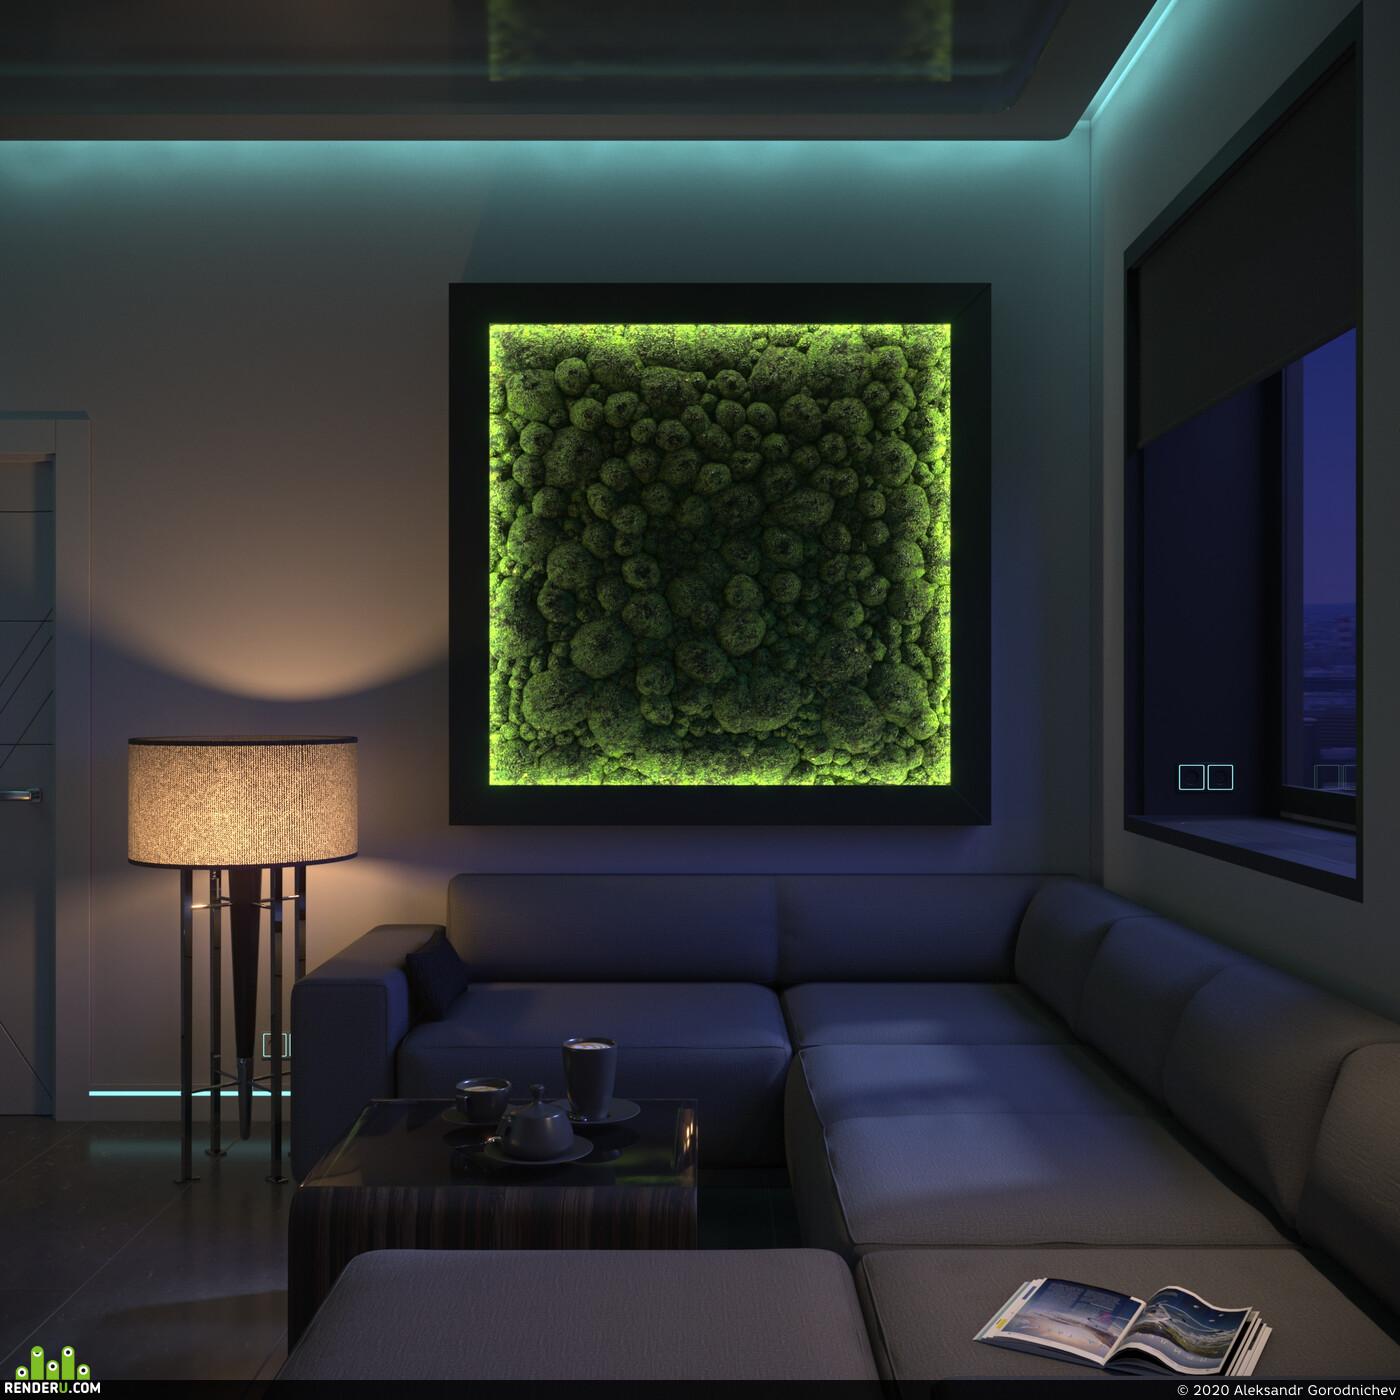 3ds Max Corona Renderer, визуализация интерьера, kitchen